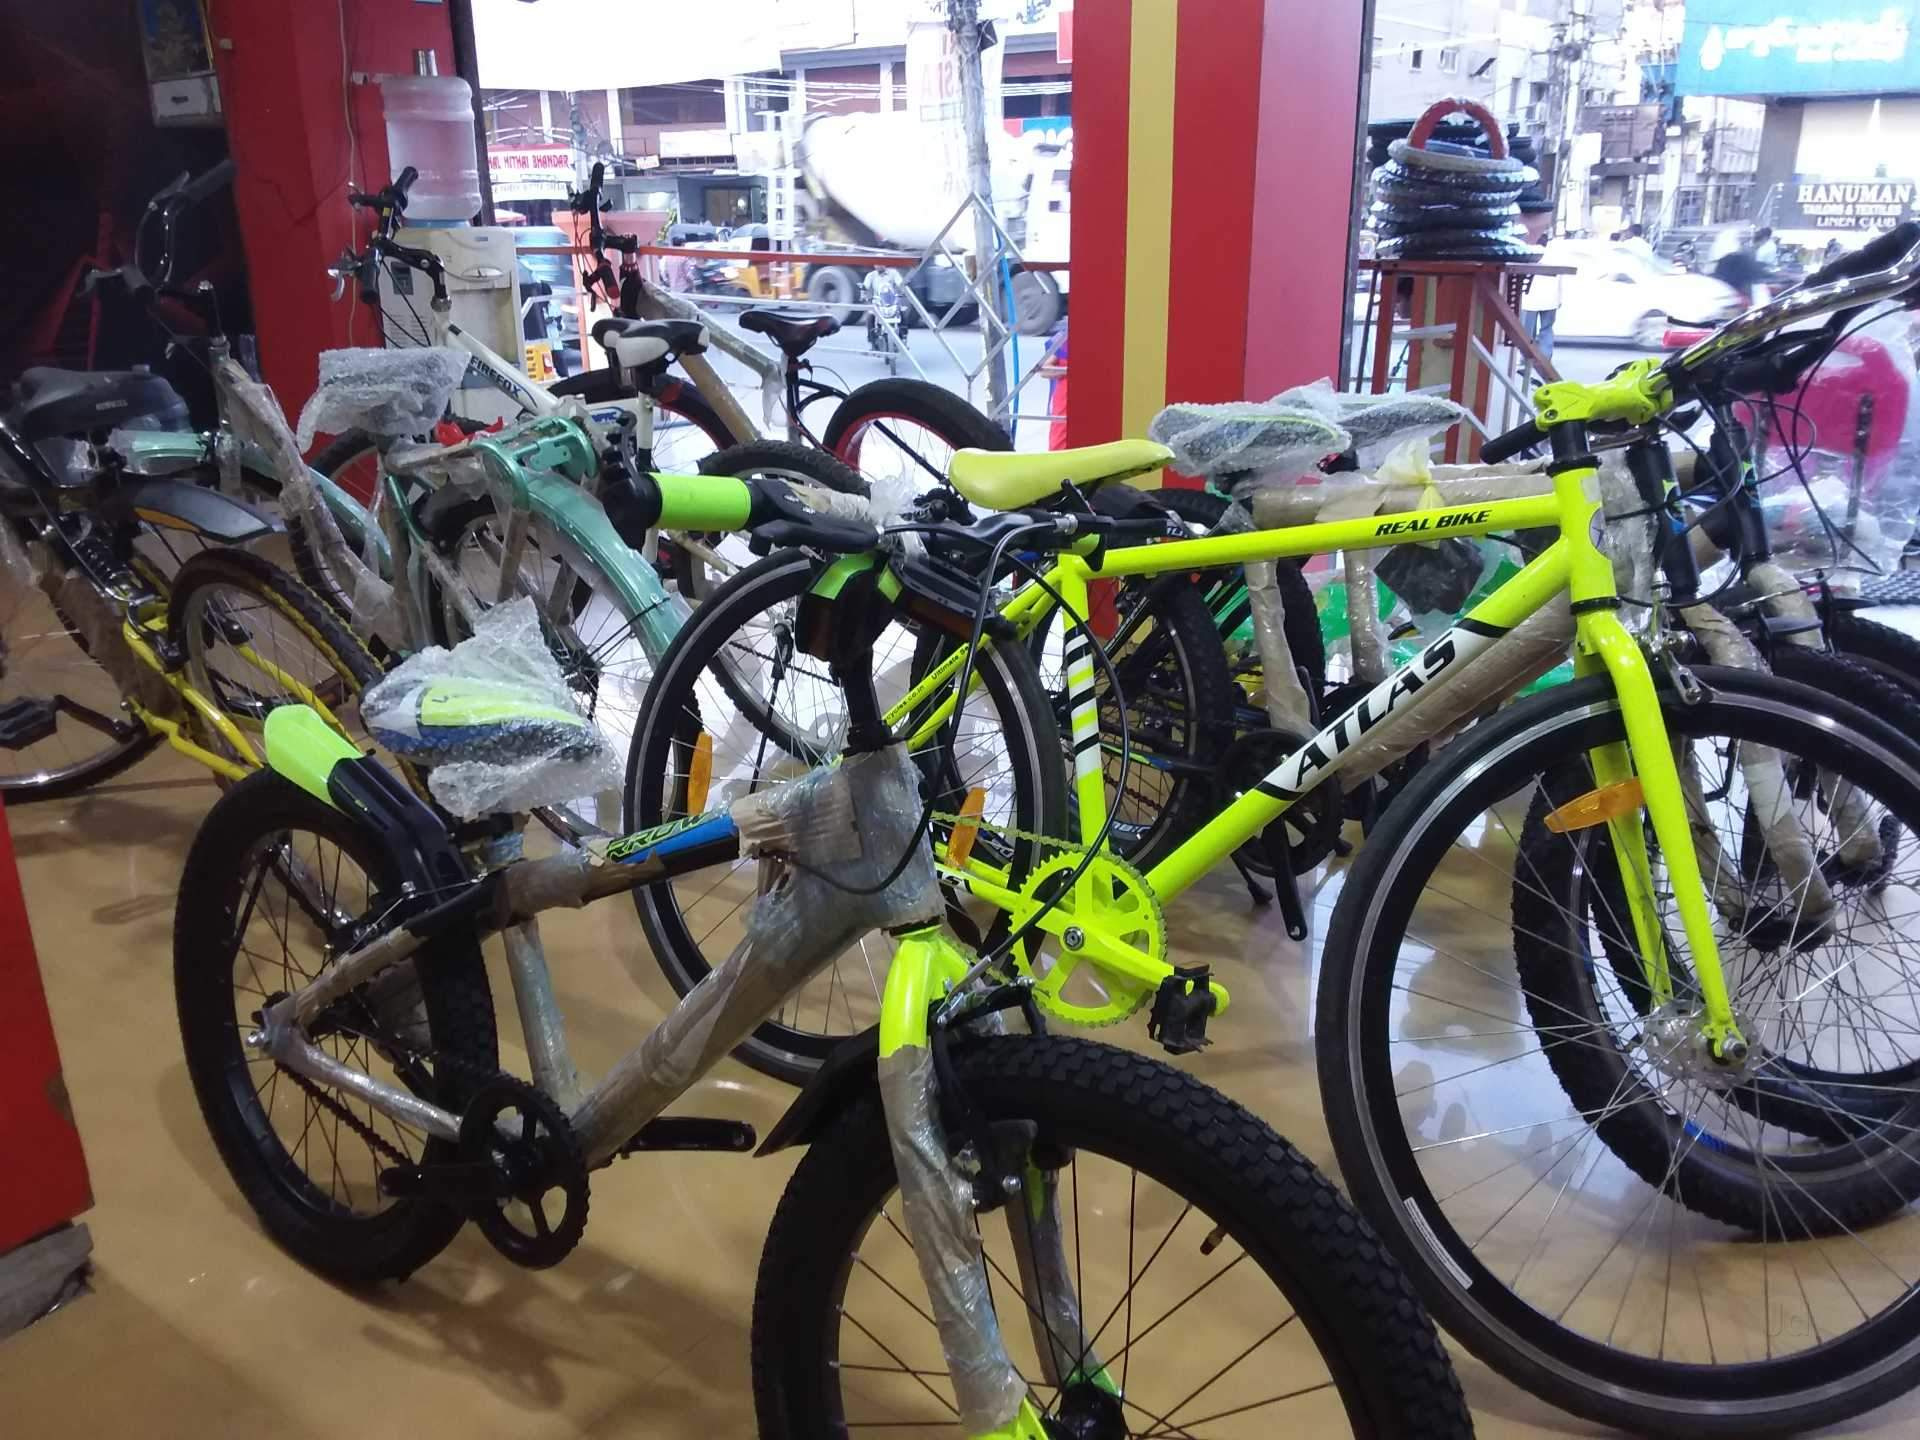 vijay-cycle-stores-hyderabad